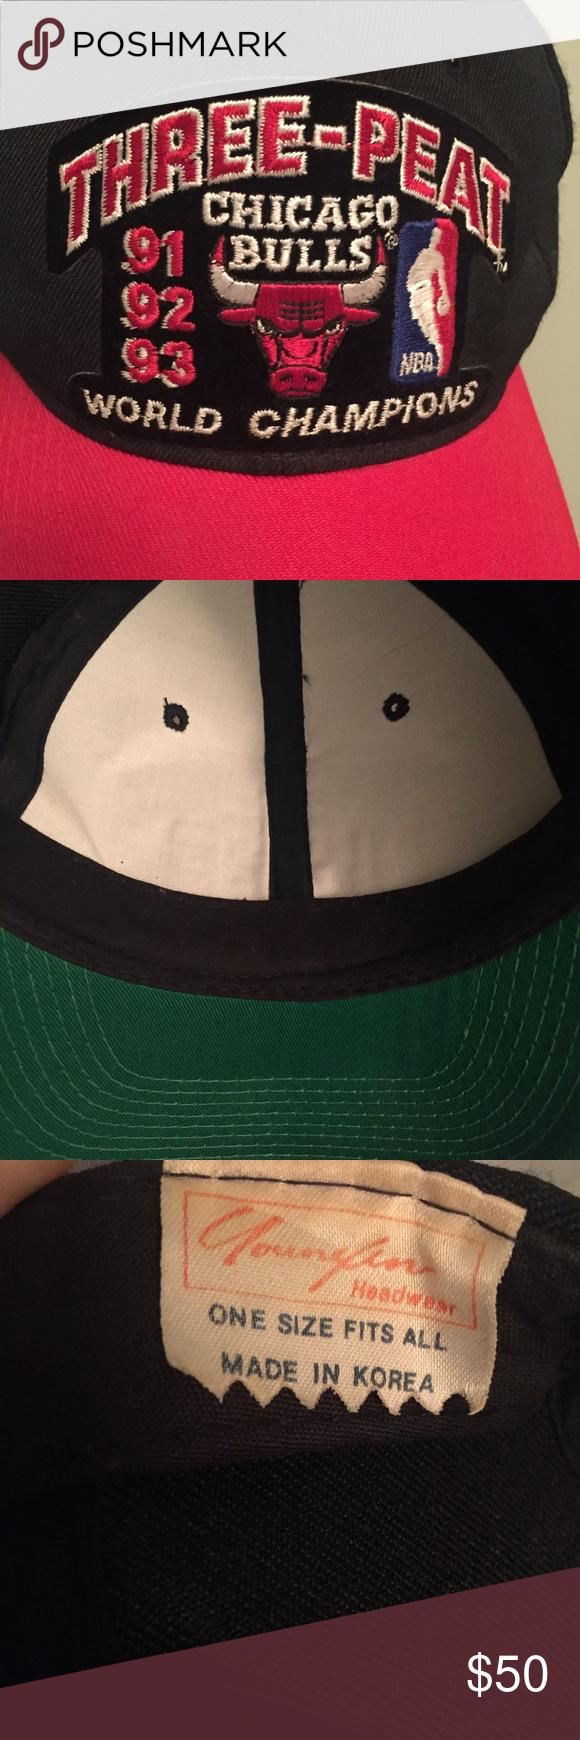 fcc9d3e8914 Chicago Bulls Three-Peat NBA Champions hat